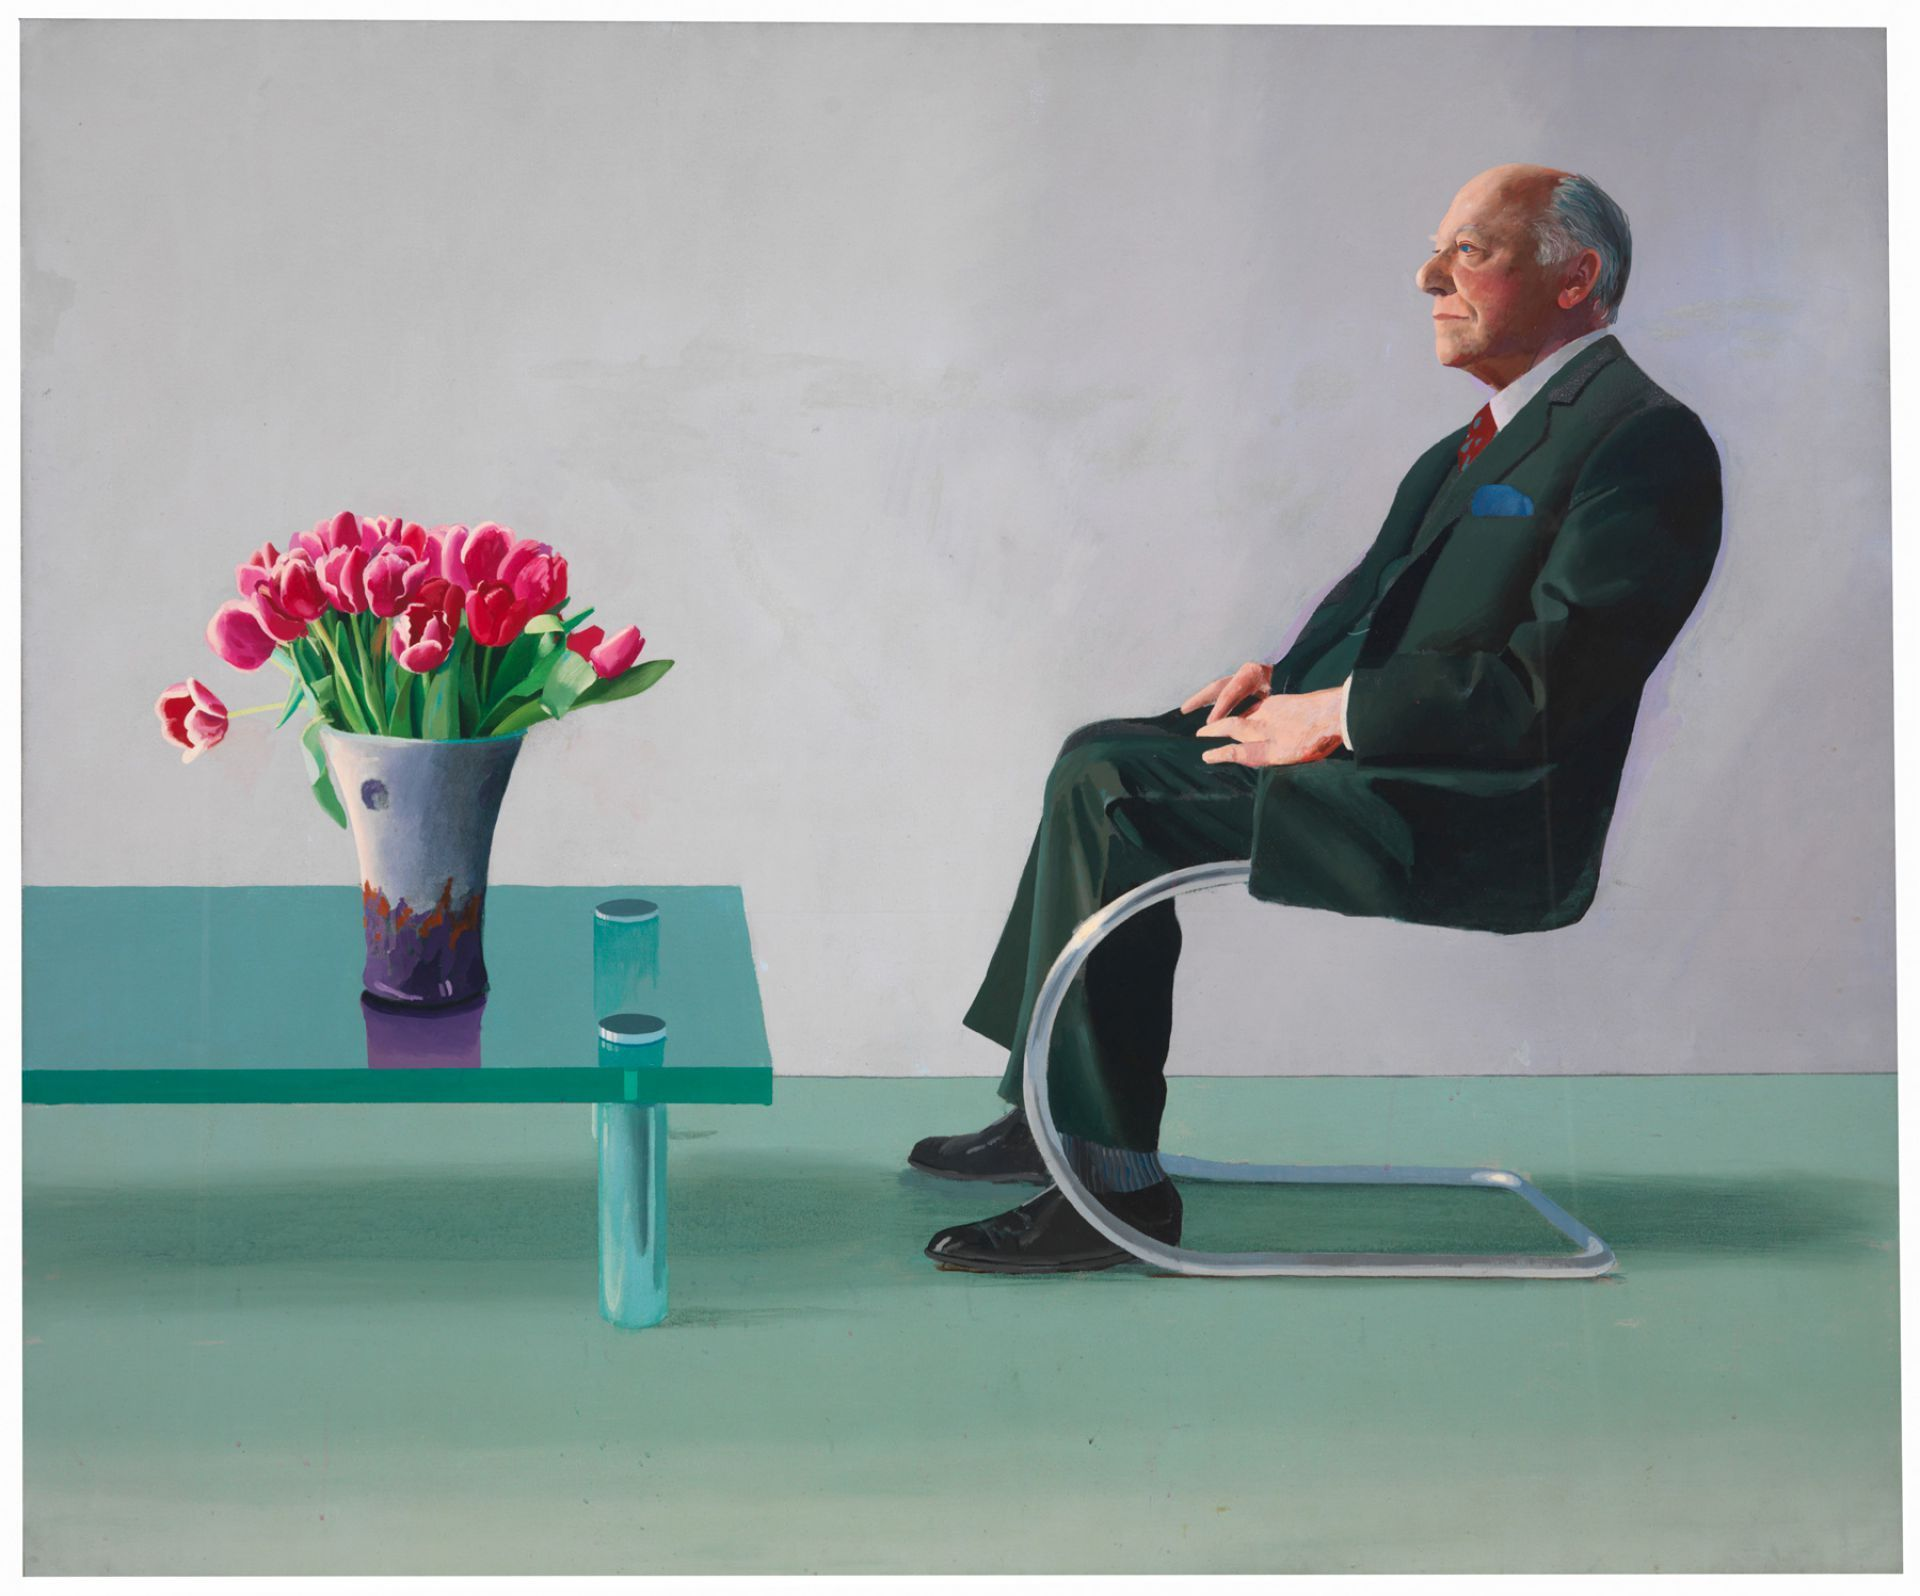 David Hockney s furniture Flamboyant meets plain seems typical